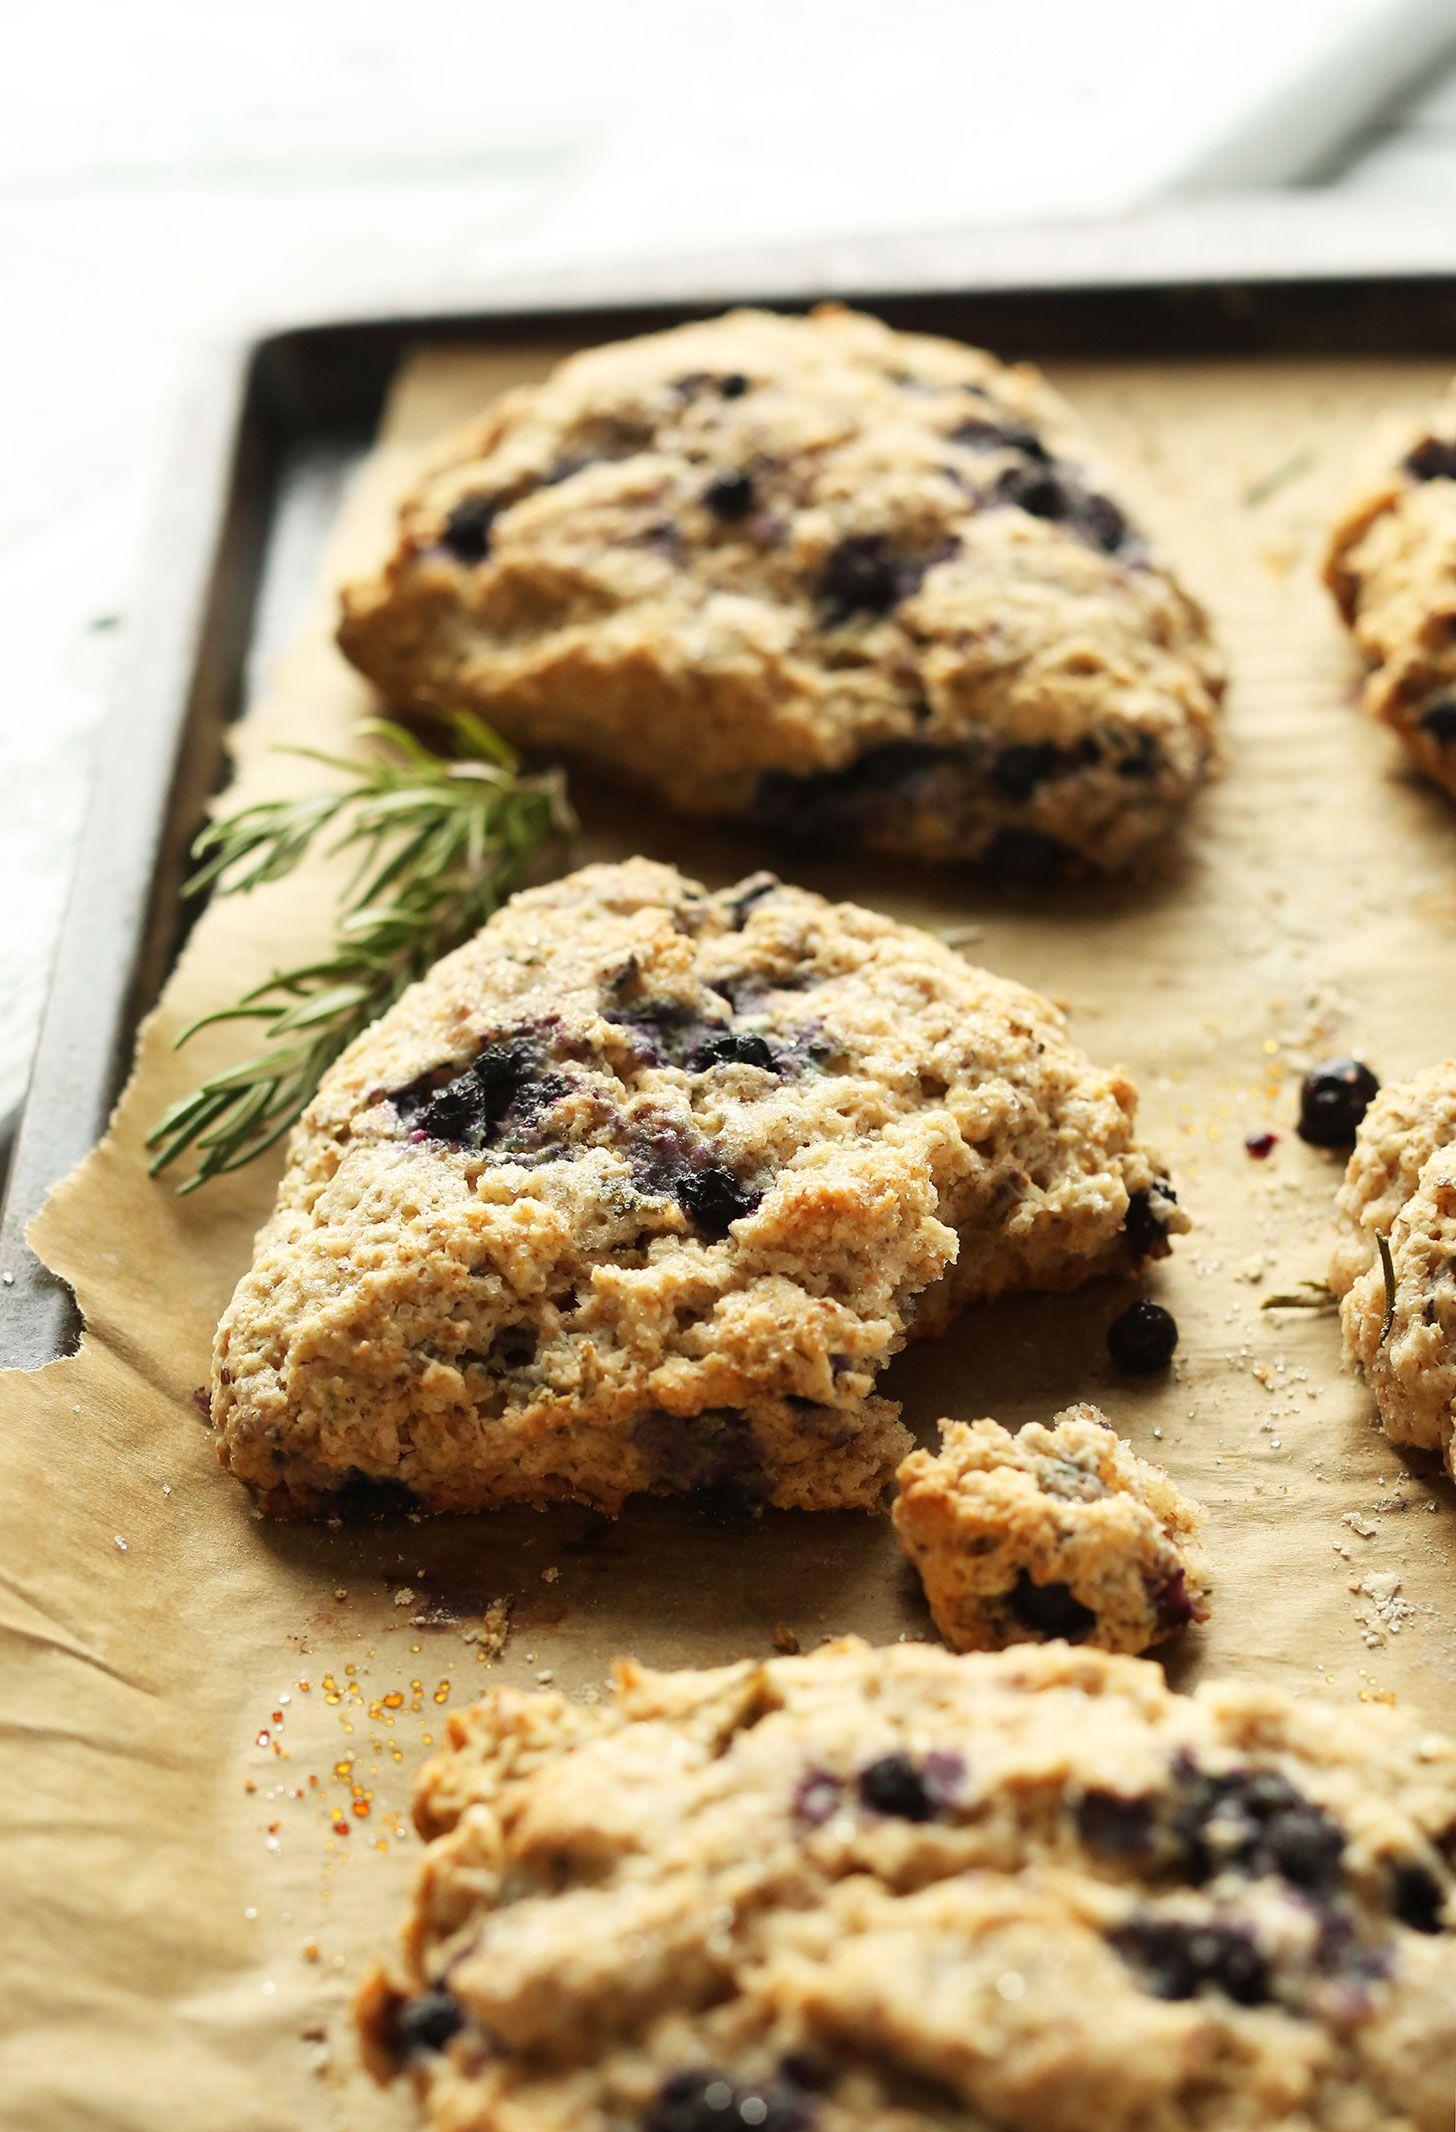 Coconut Oil Blueberry Scones Minimalist Baker Recipes Recipe Blueberry Scones Baker Recipes Food